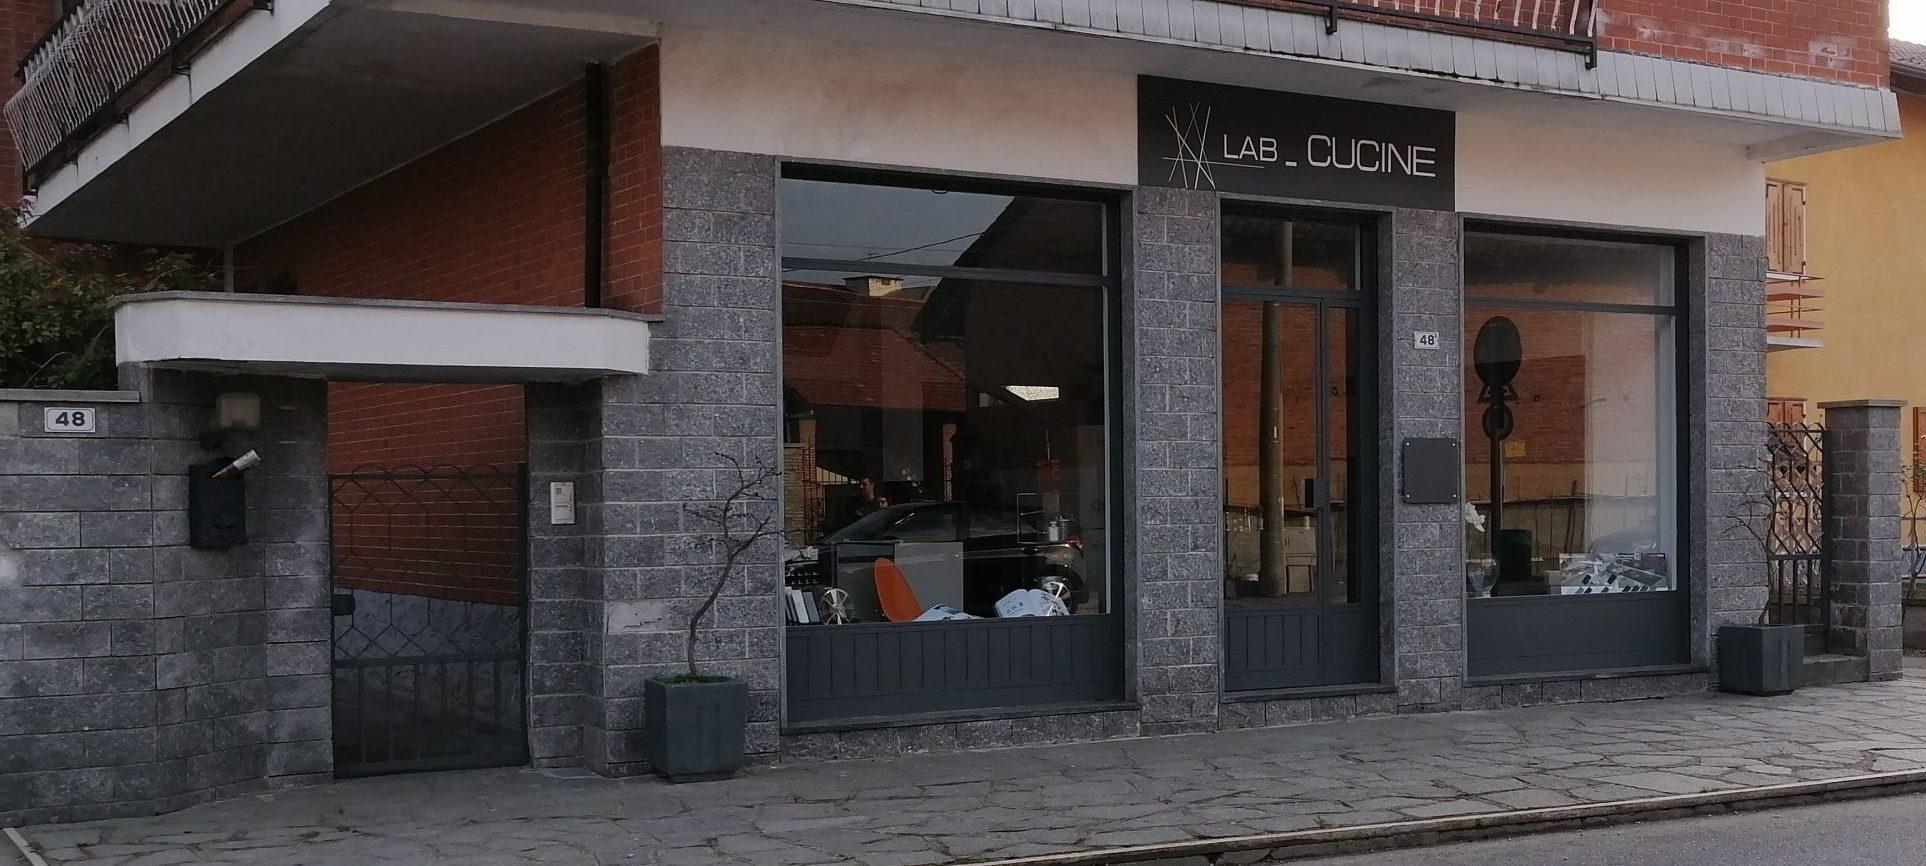 Sede Lab Cucine Torino-negozio cucine a Torino